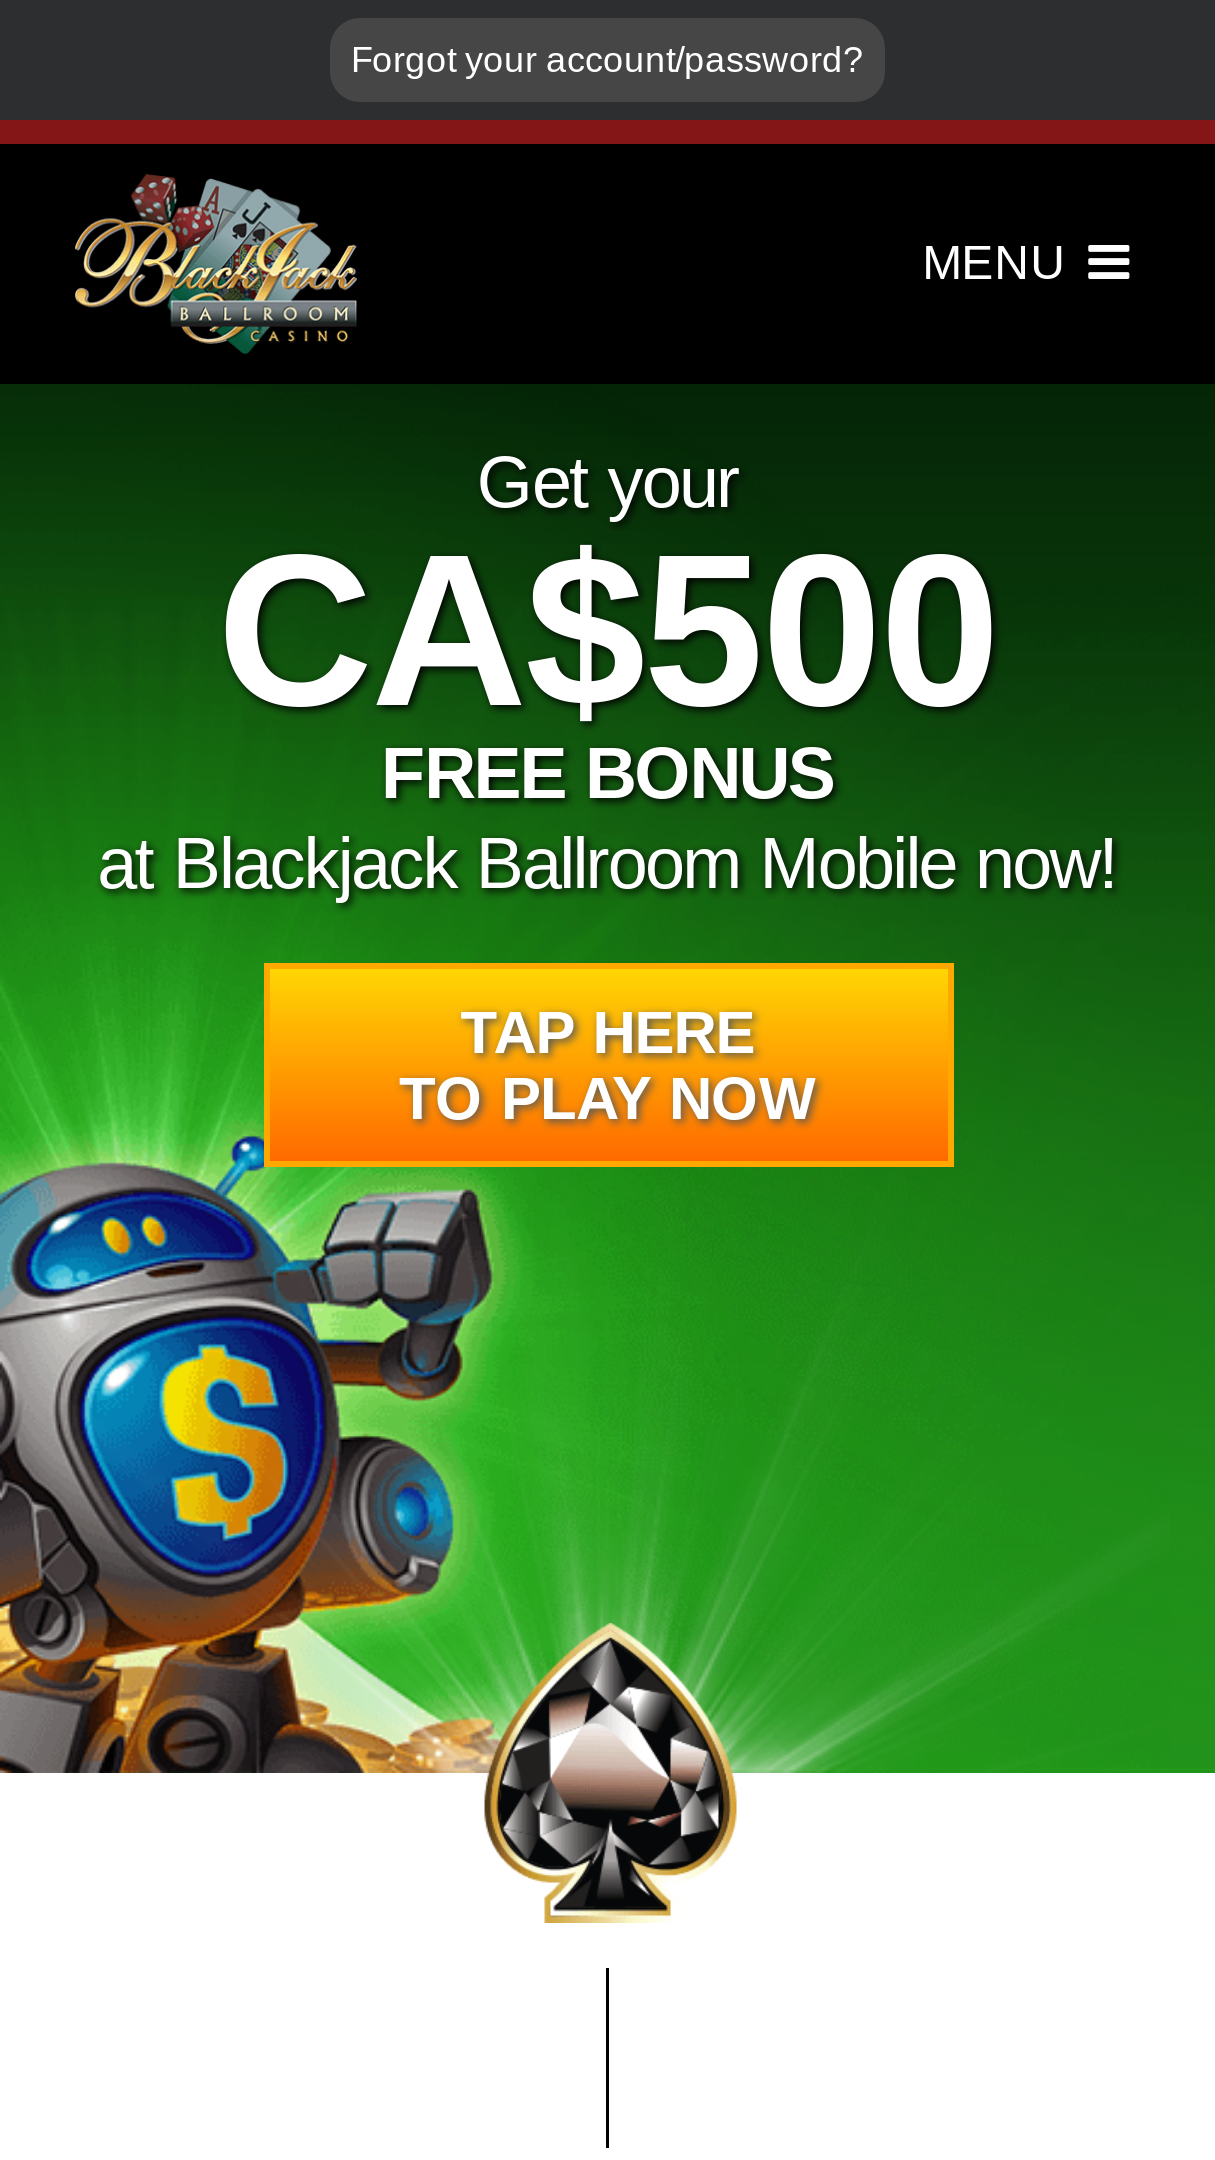 Blackjack Ballroom Casino App Download For Android Apk Iphone